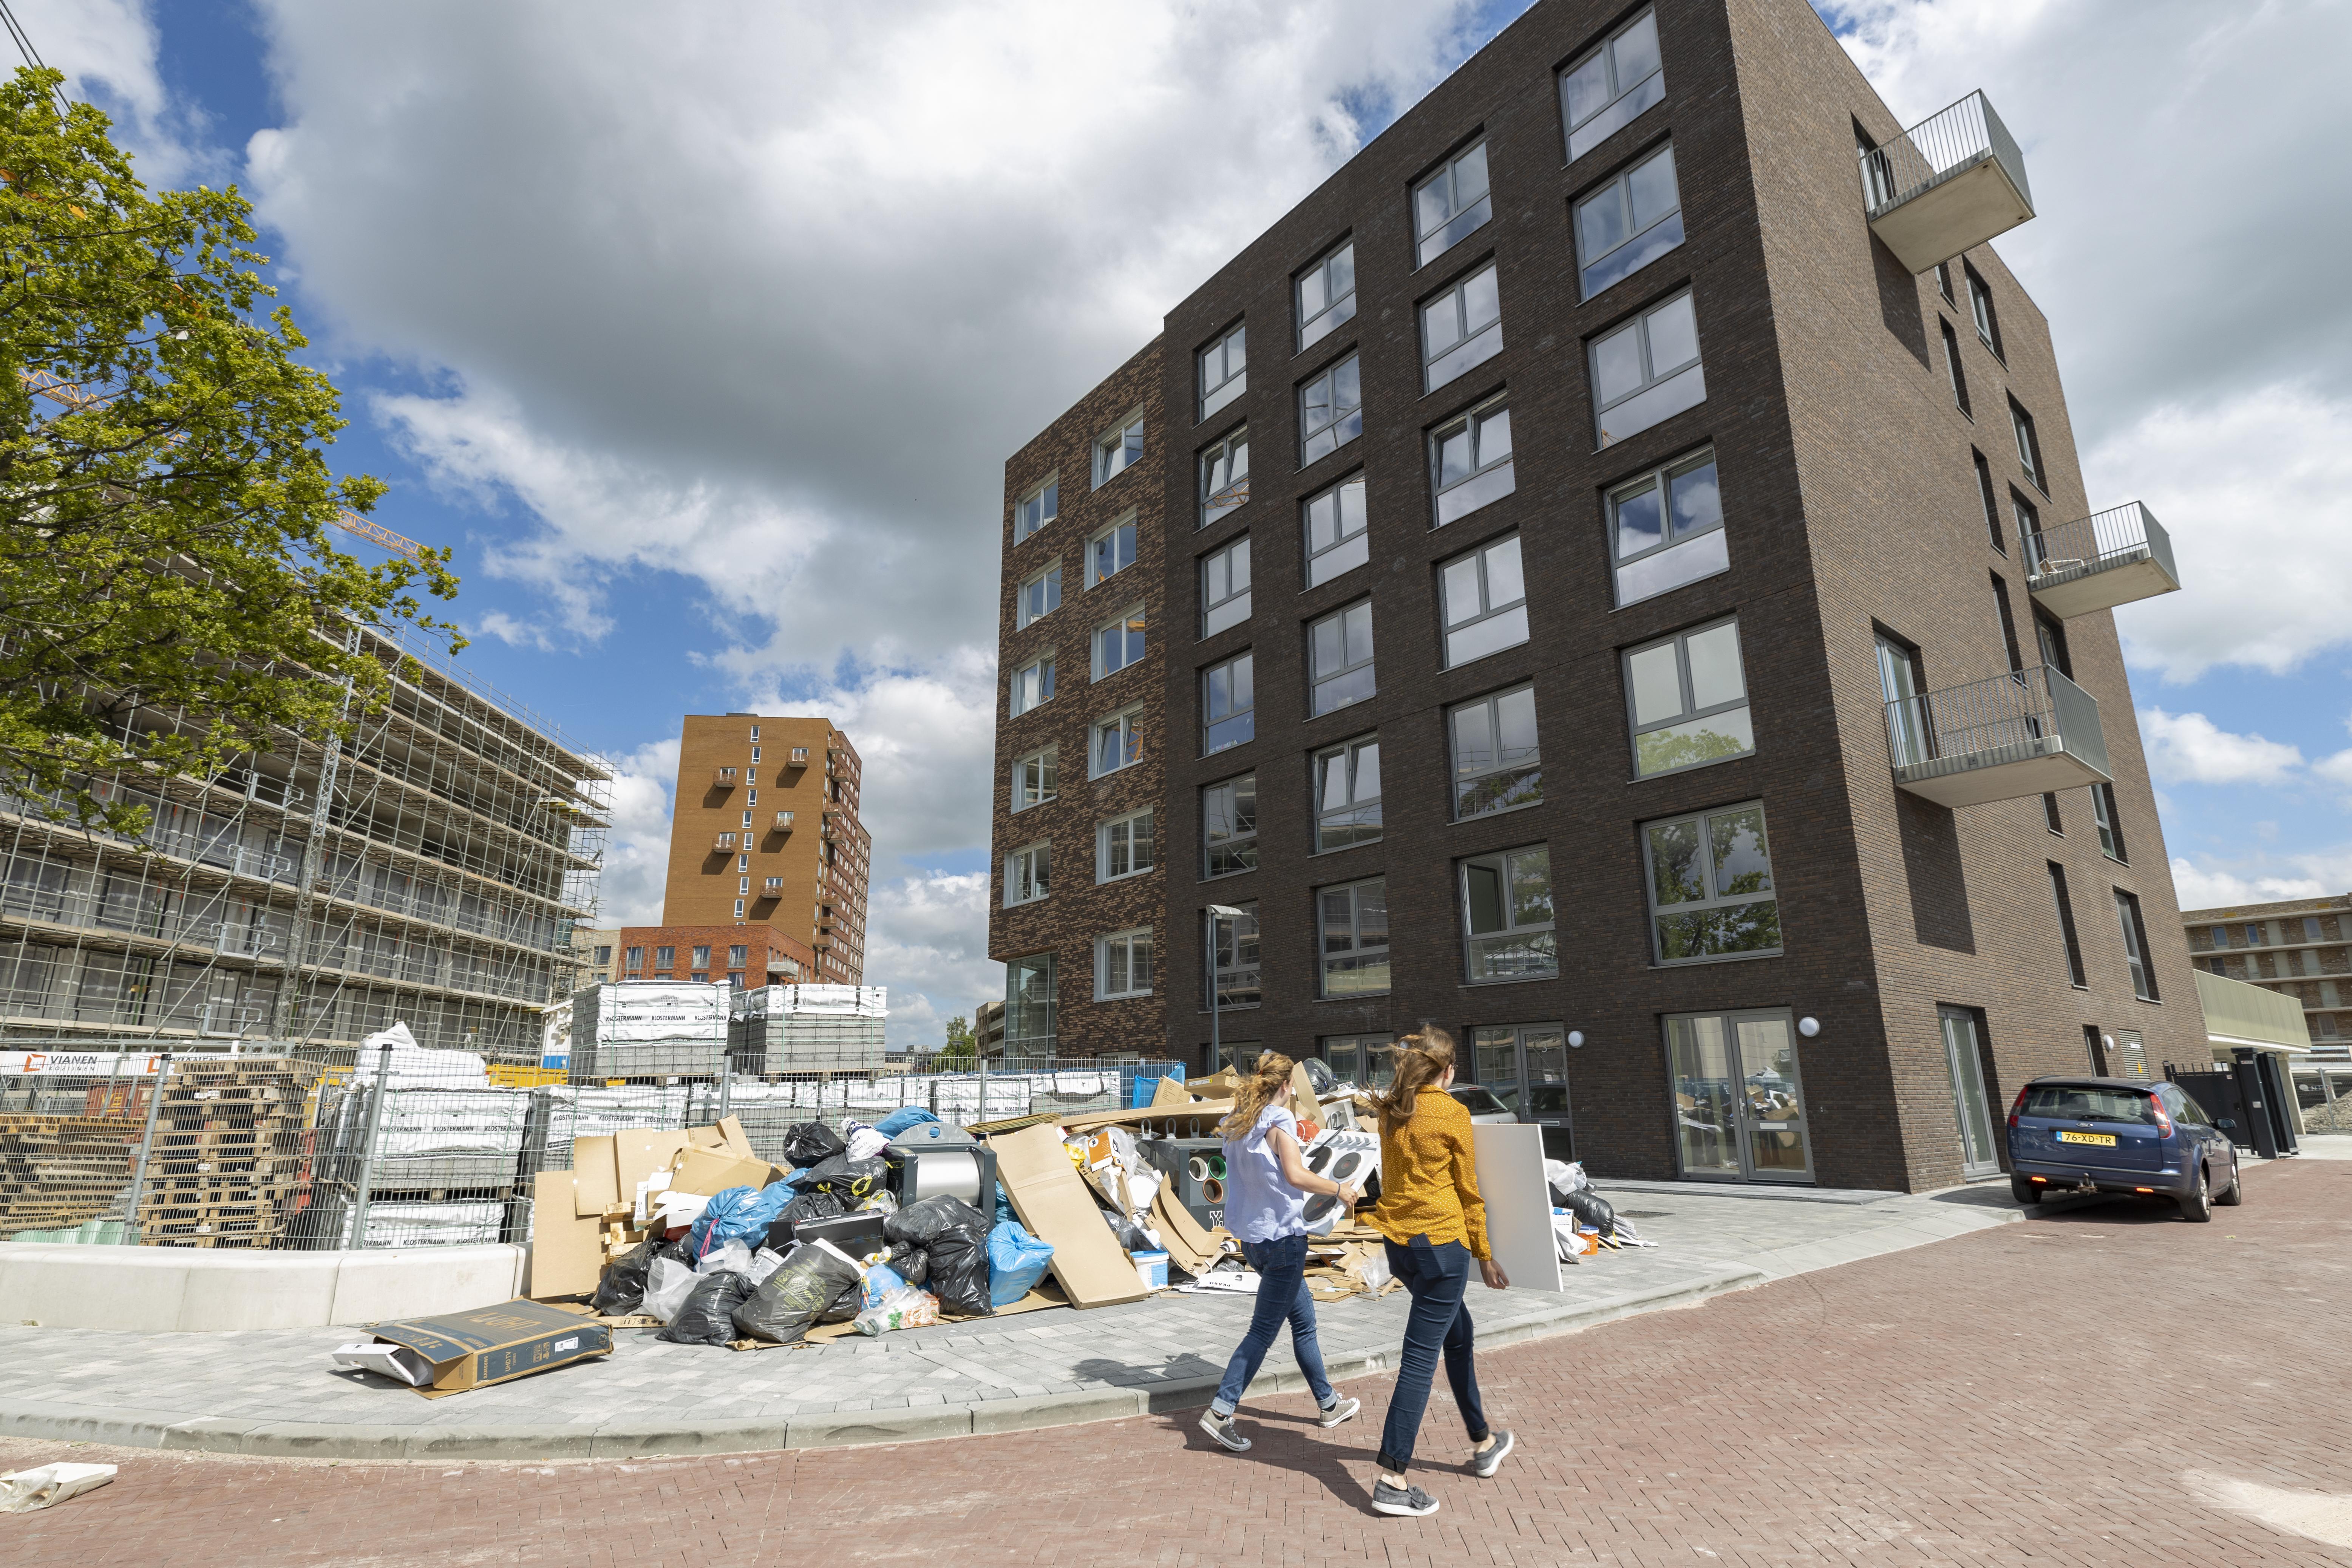 Project L: Bouwspurt studentenhuisvesting in Leiden